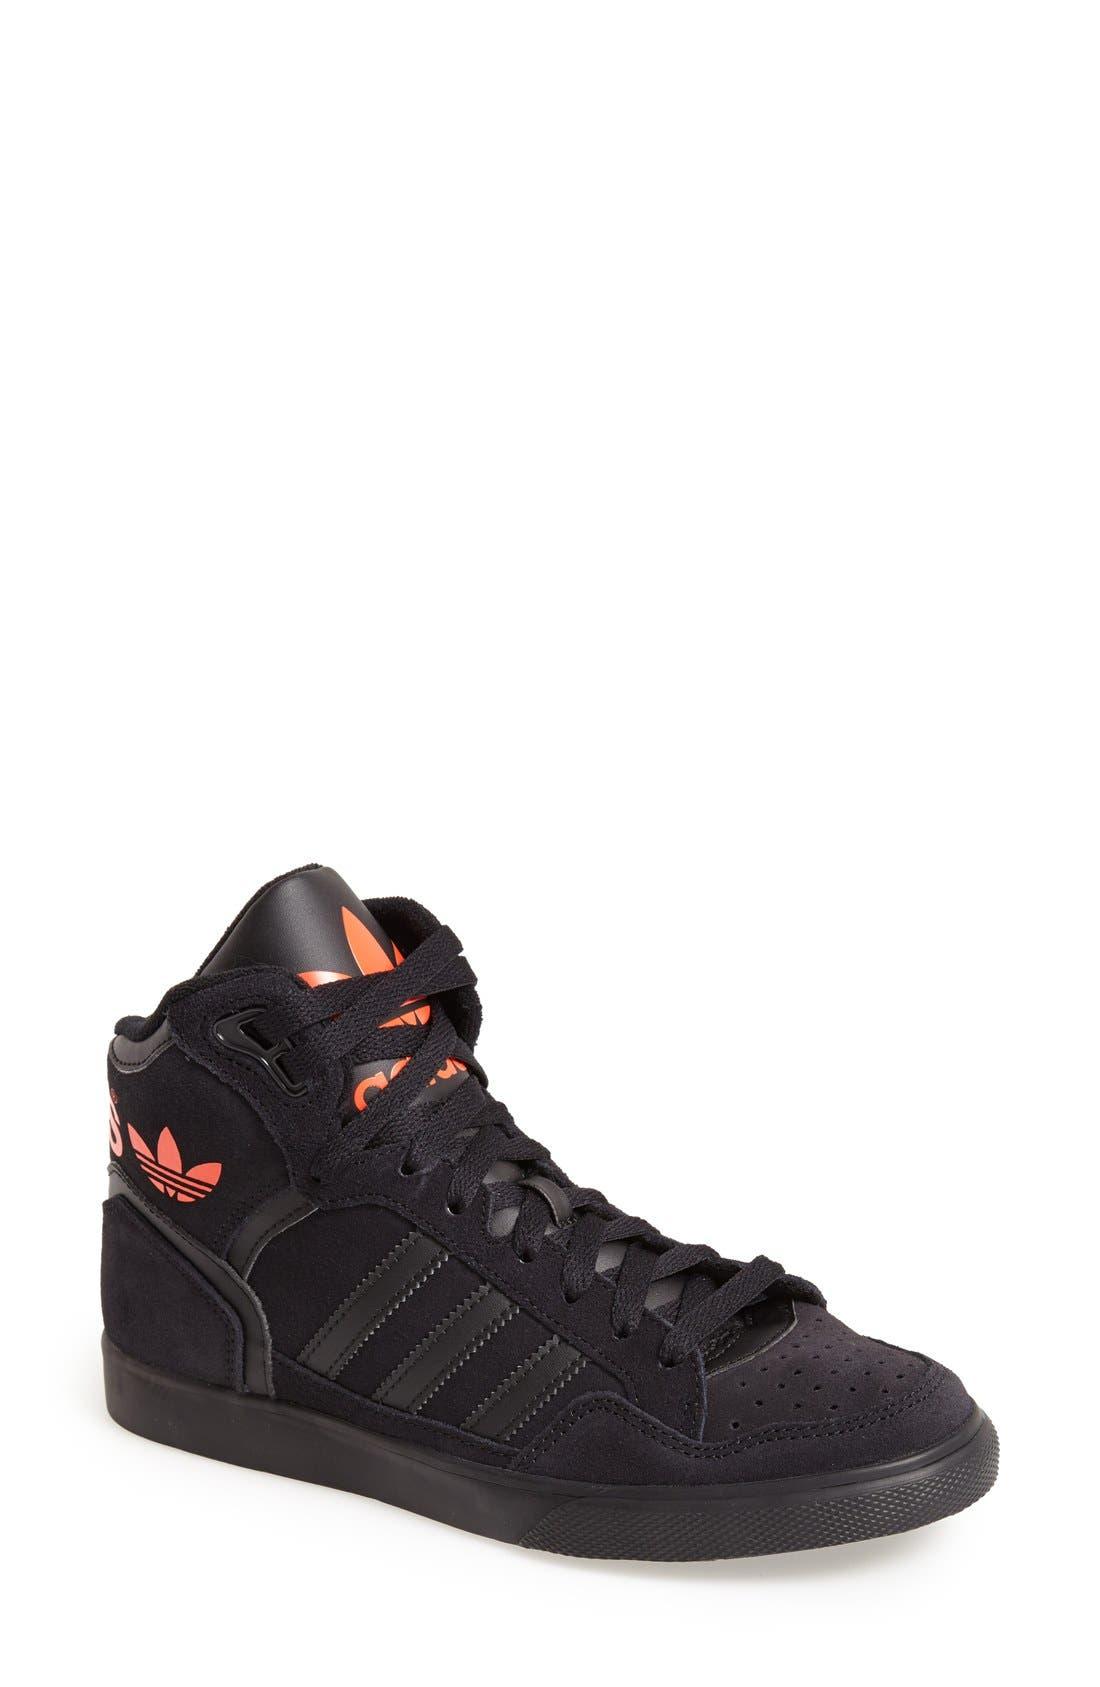 Alternate Image 1 Selected - adidas 'Extaball' Sneaker (Women)